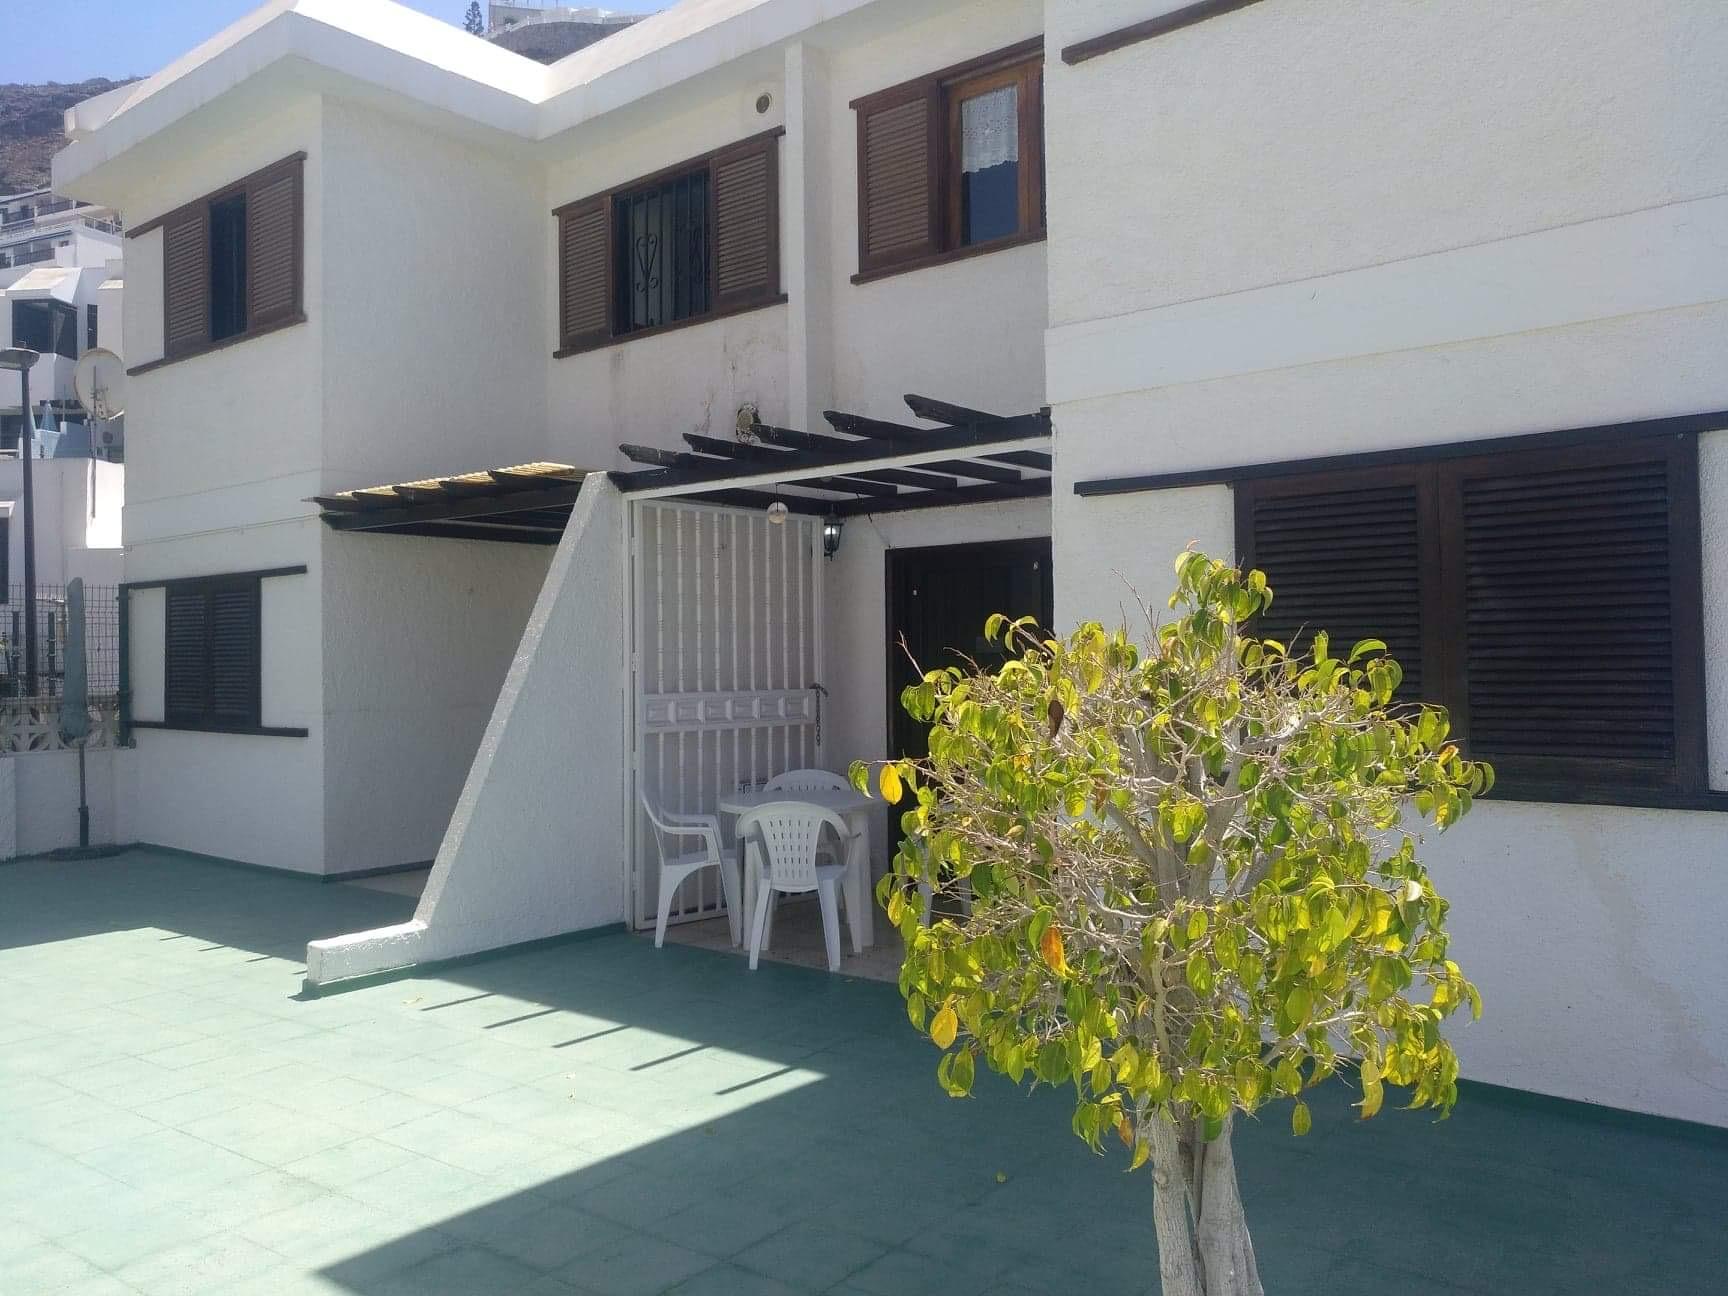 2 Bedroom Ground Floor Apartment in Puerto Rico – Montana Clara Complex